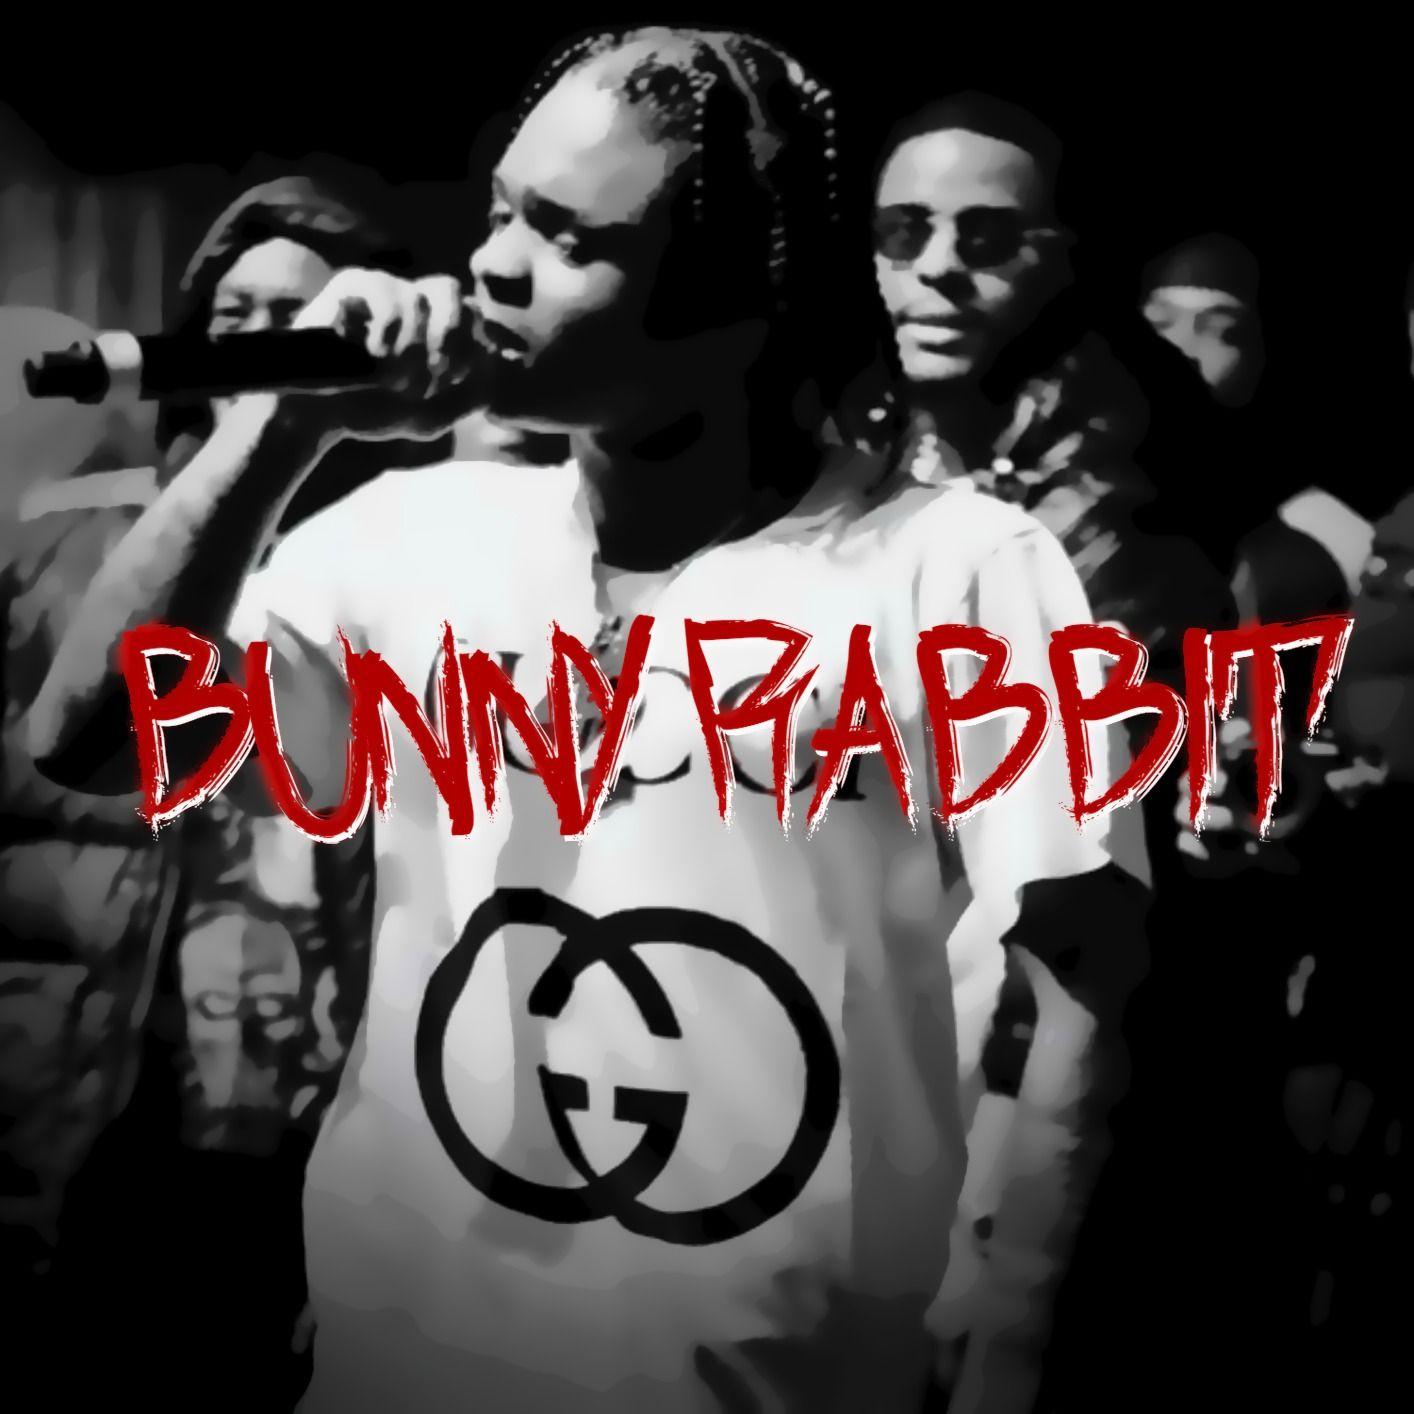 BUNNY RABBIT - DETROIT x BAY AREA TYPE BEAT INSTRUMENTAL 2019 by